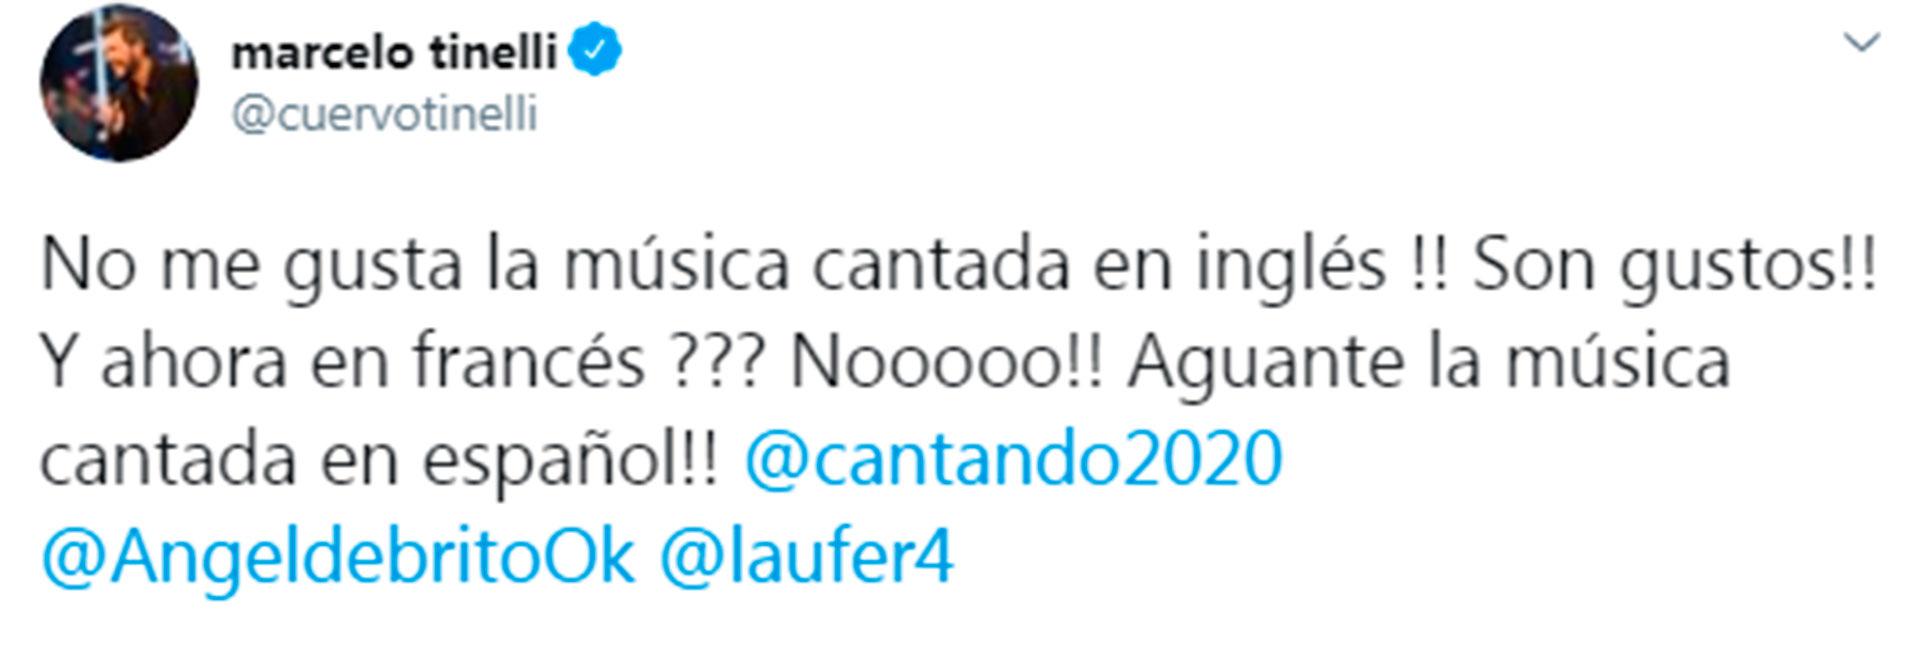 Marcelo Tinelli se manifestó a favor de que los participantes canten en español